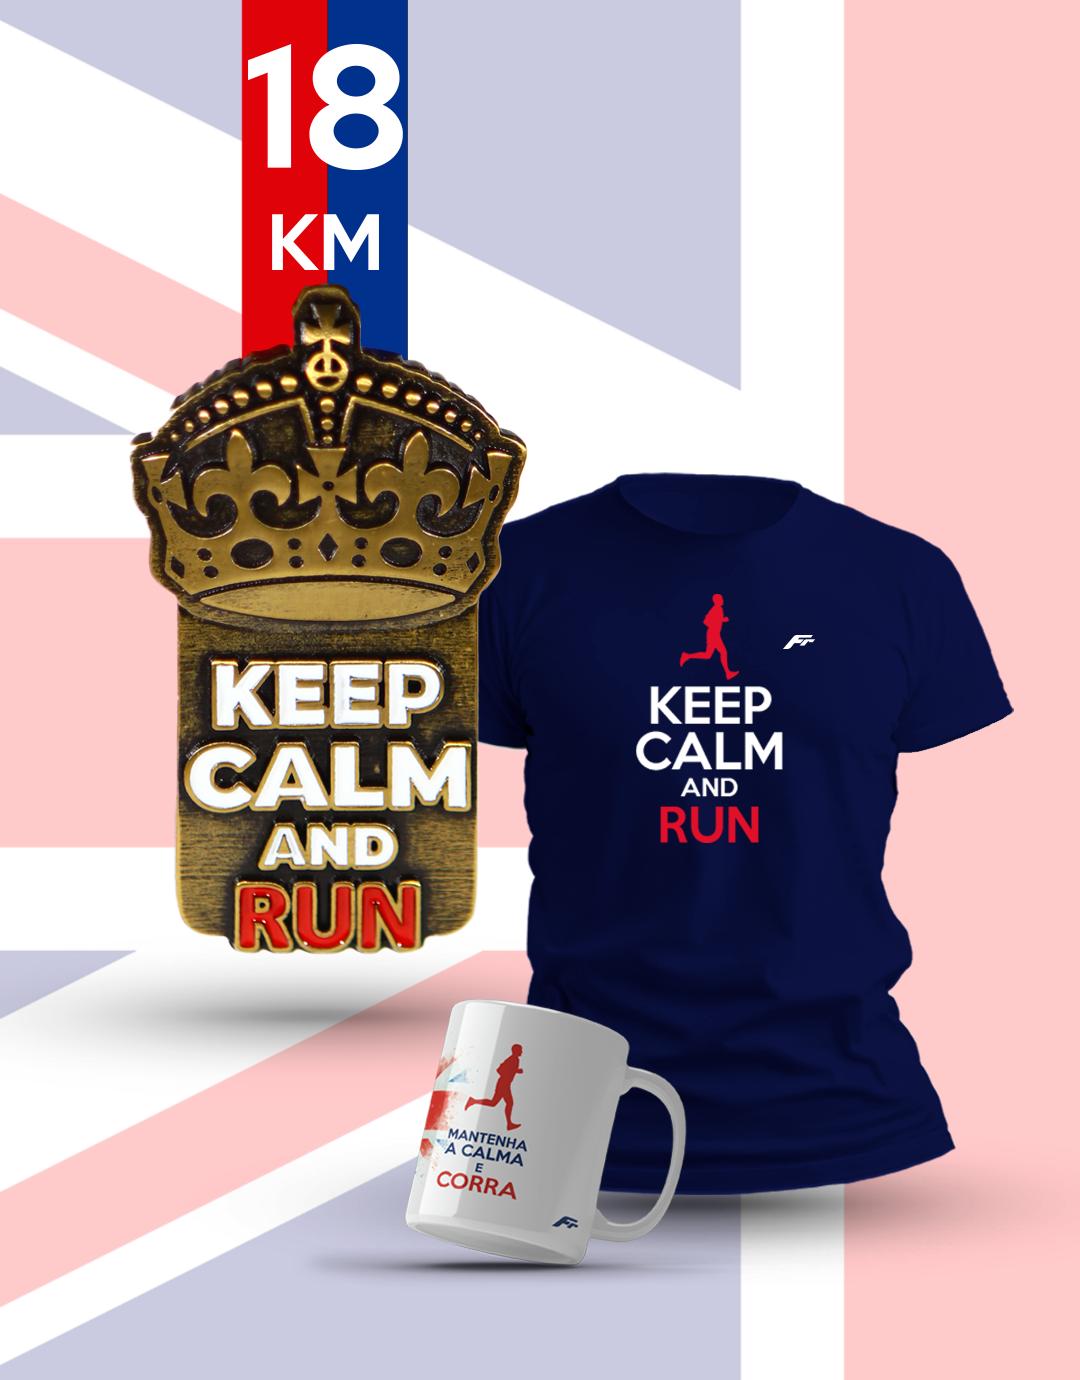 Pacote Keep Run 05 - 18KM